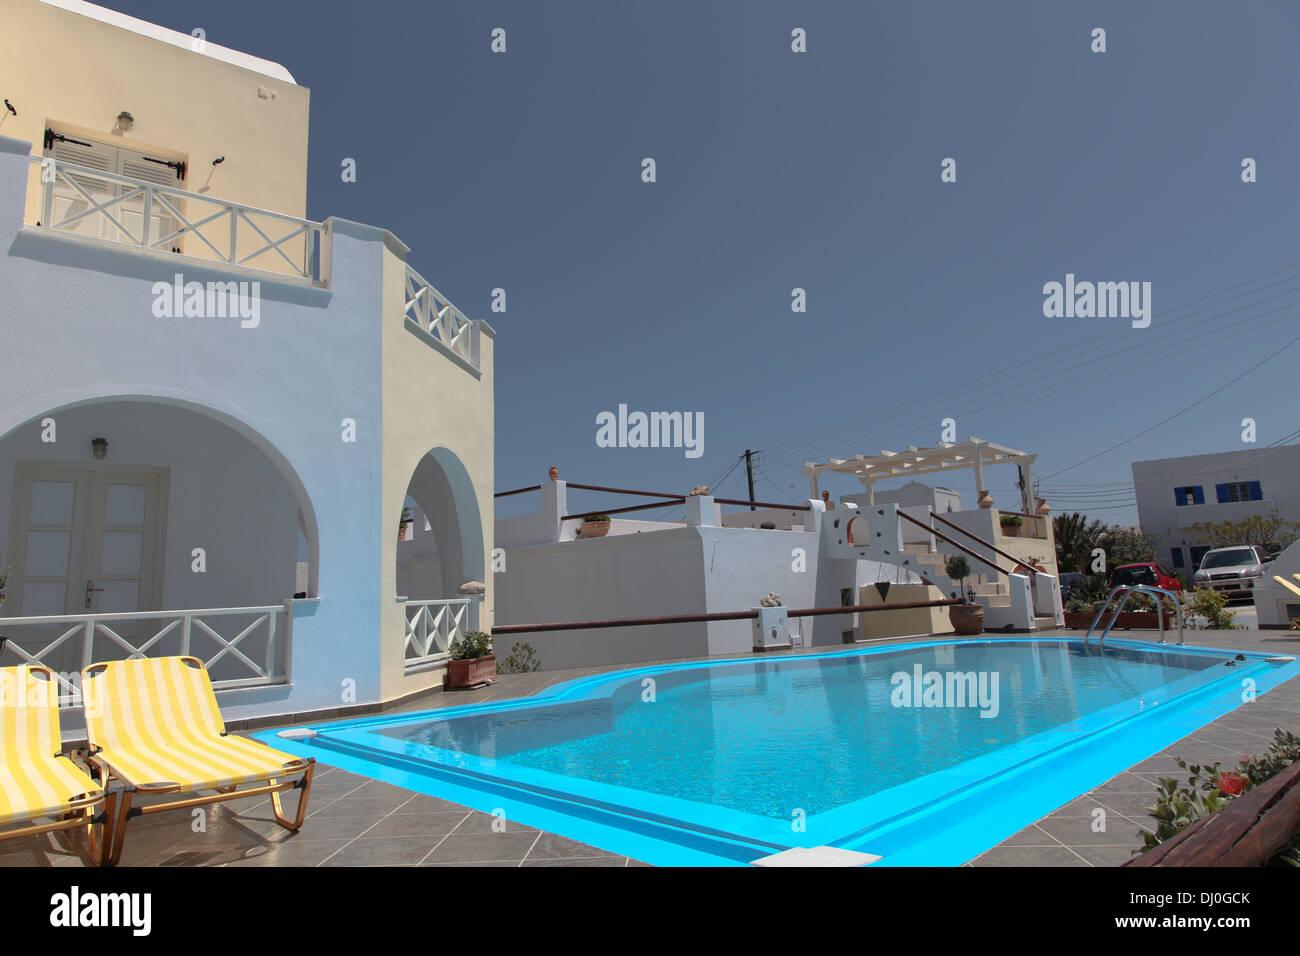 Plunge Bath Stock Photos & Plunge Bath Stock Images - Alamy